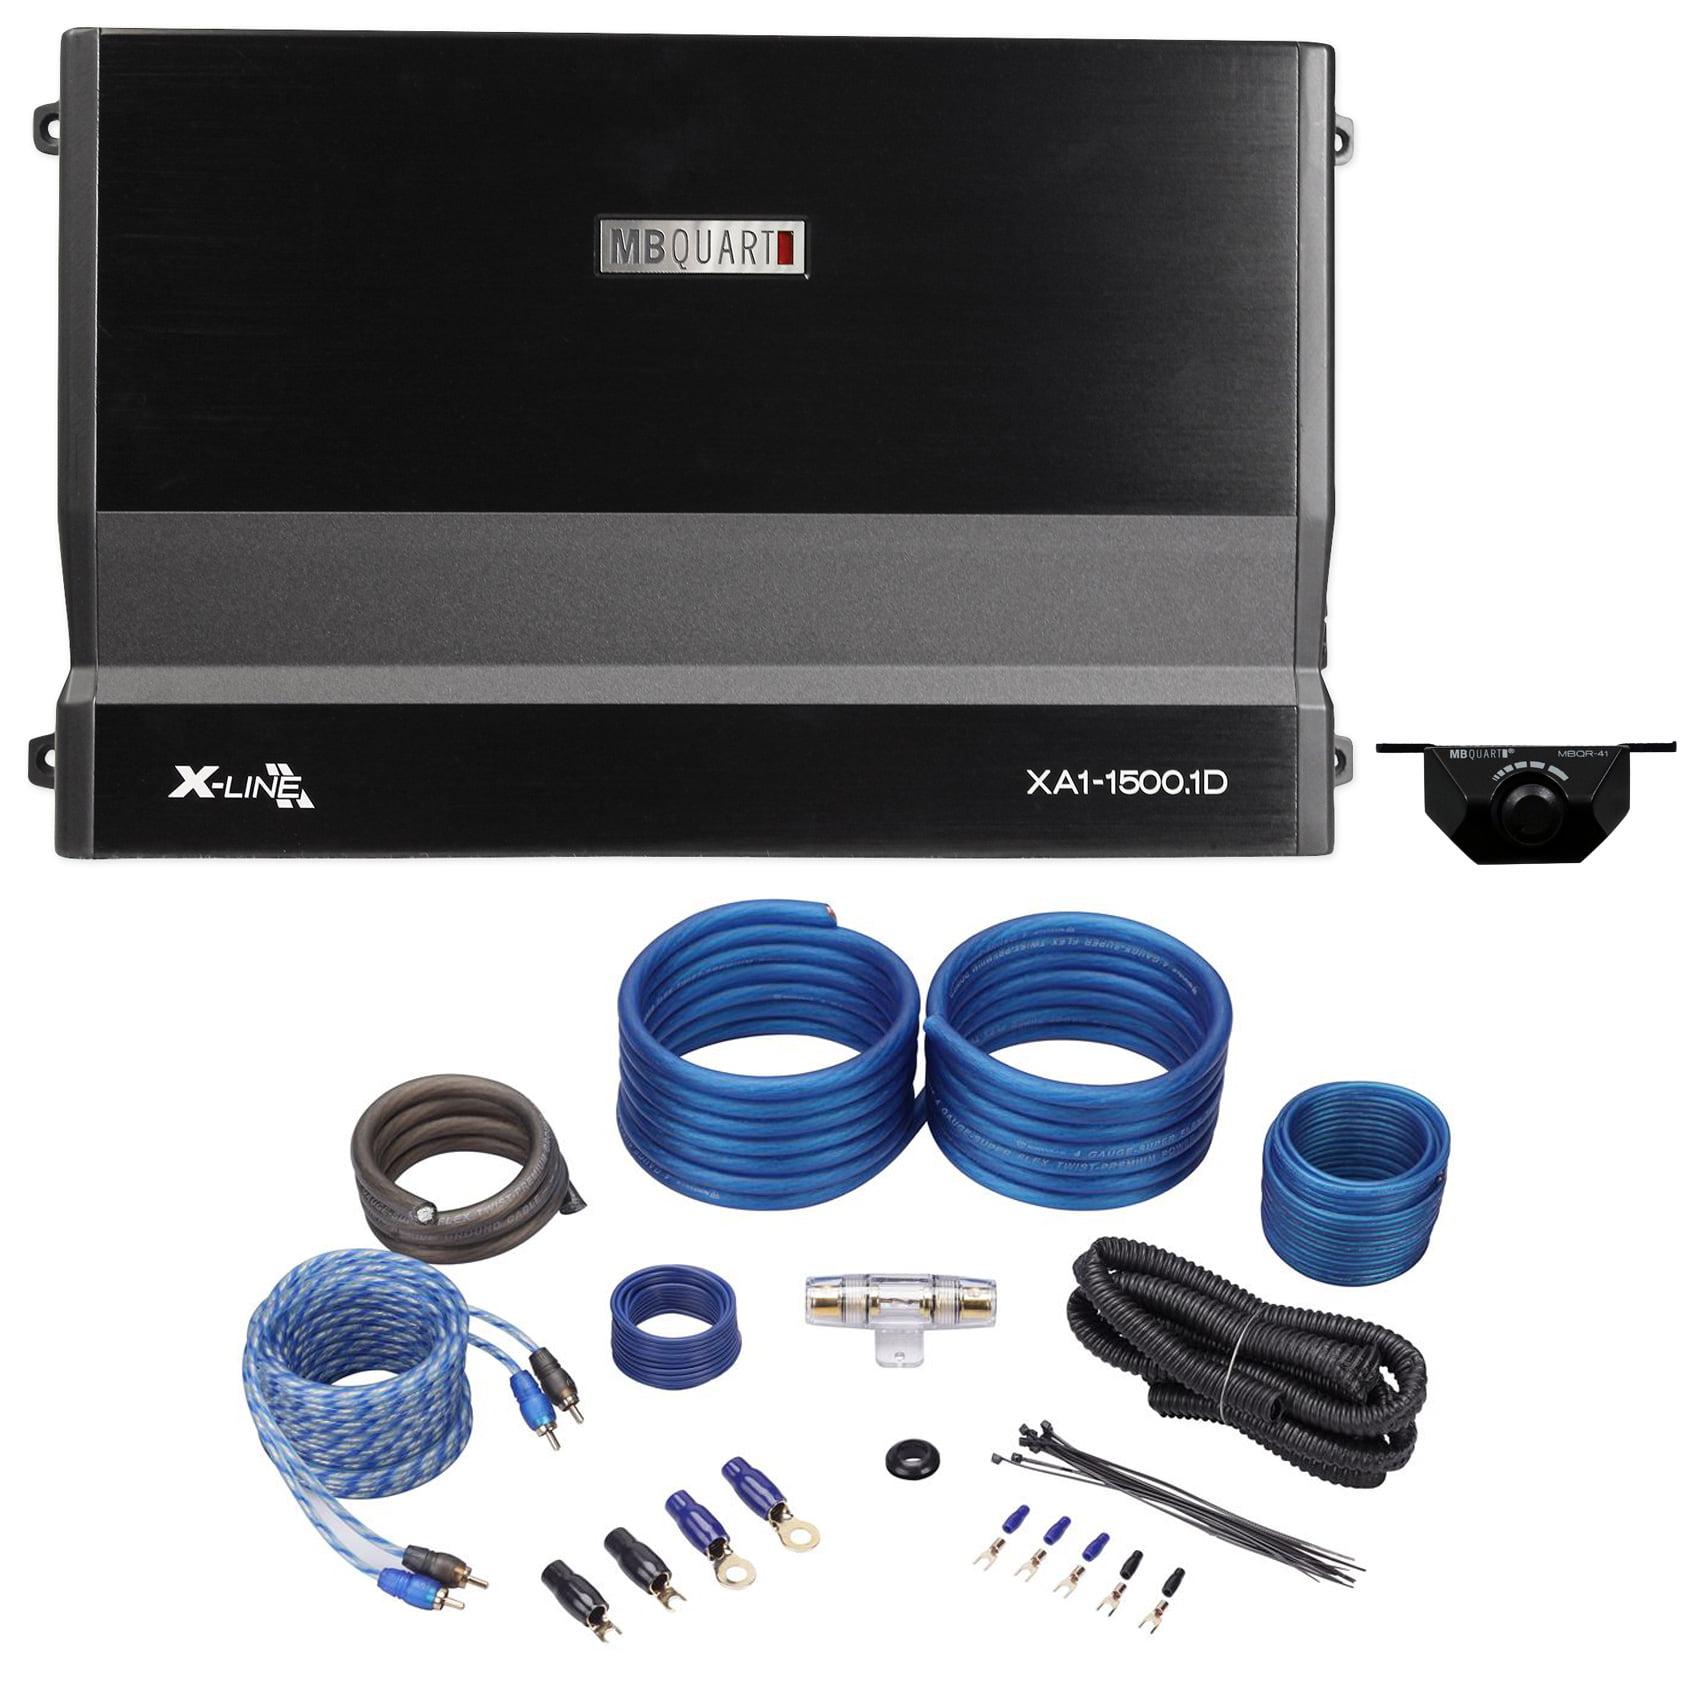 Mb Quart Xa1 15001d 1500w Rms X Line Series Mono Class D Car Premium Amplifiers Digital Audio System Amplifier Amp Kit